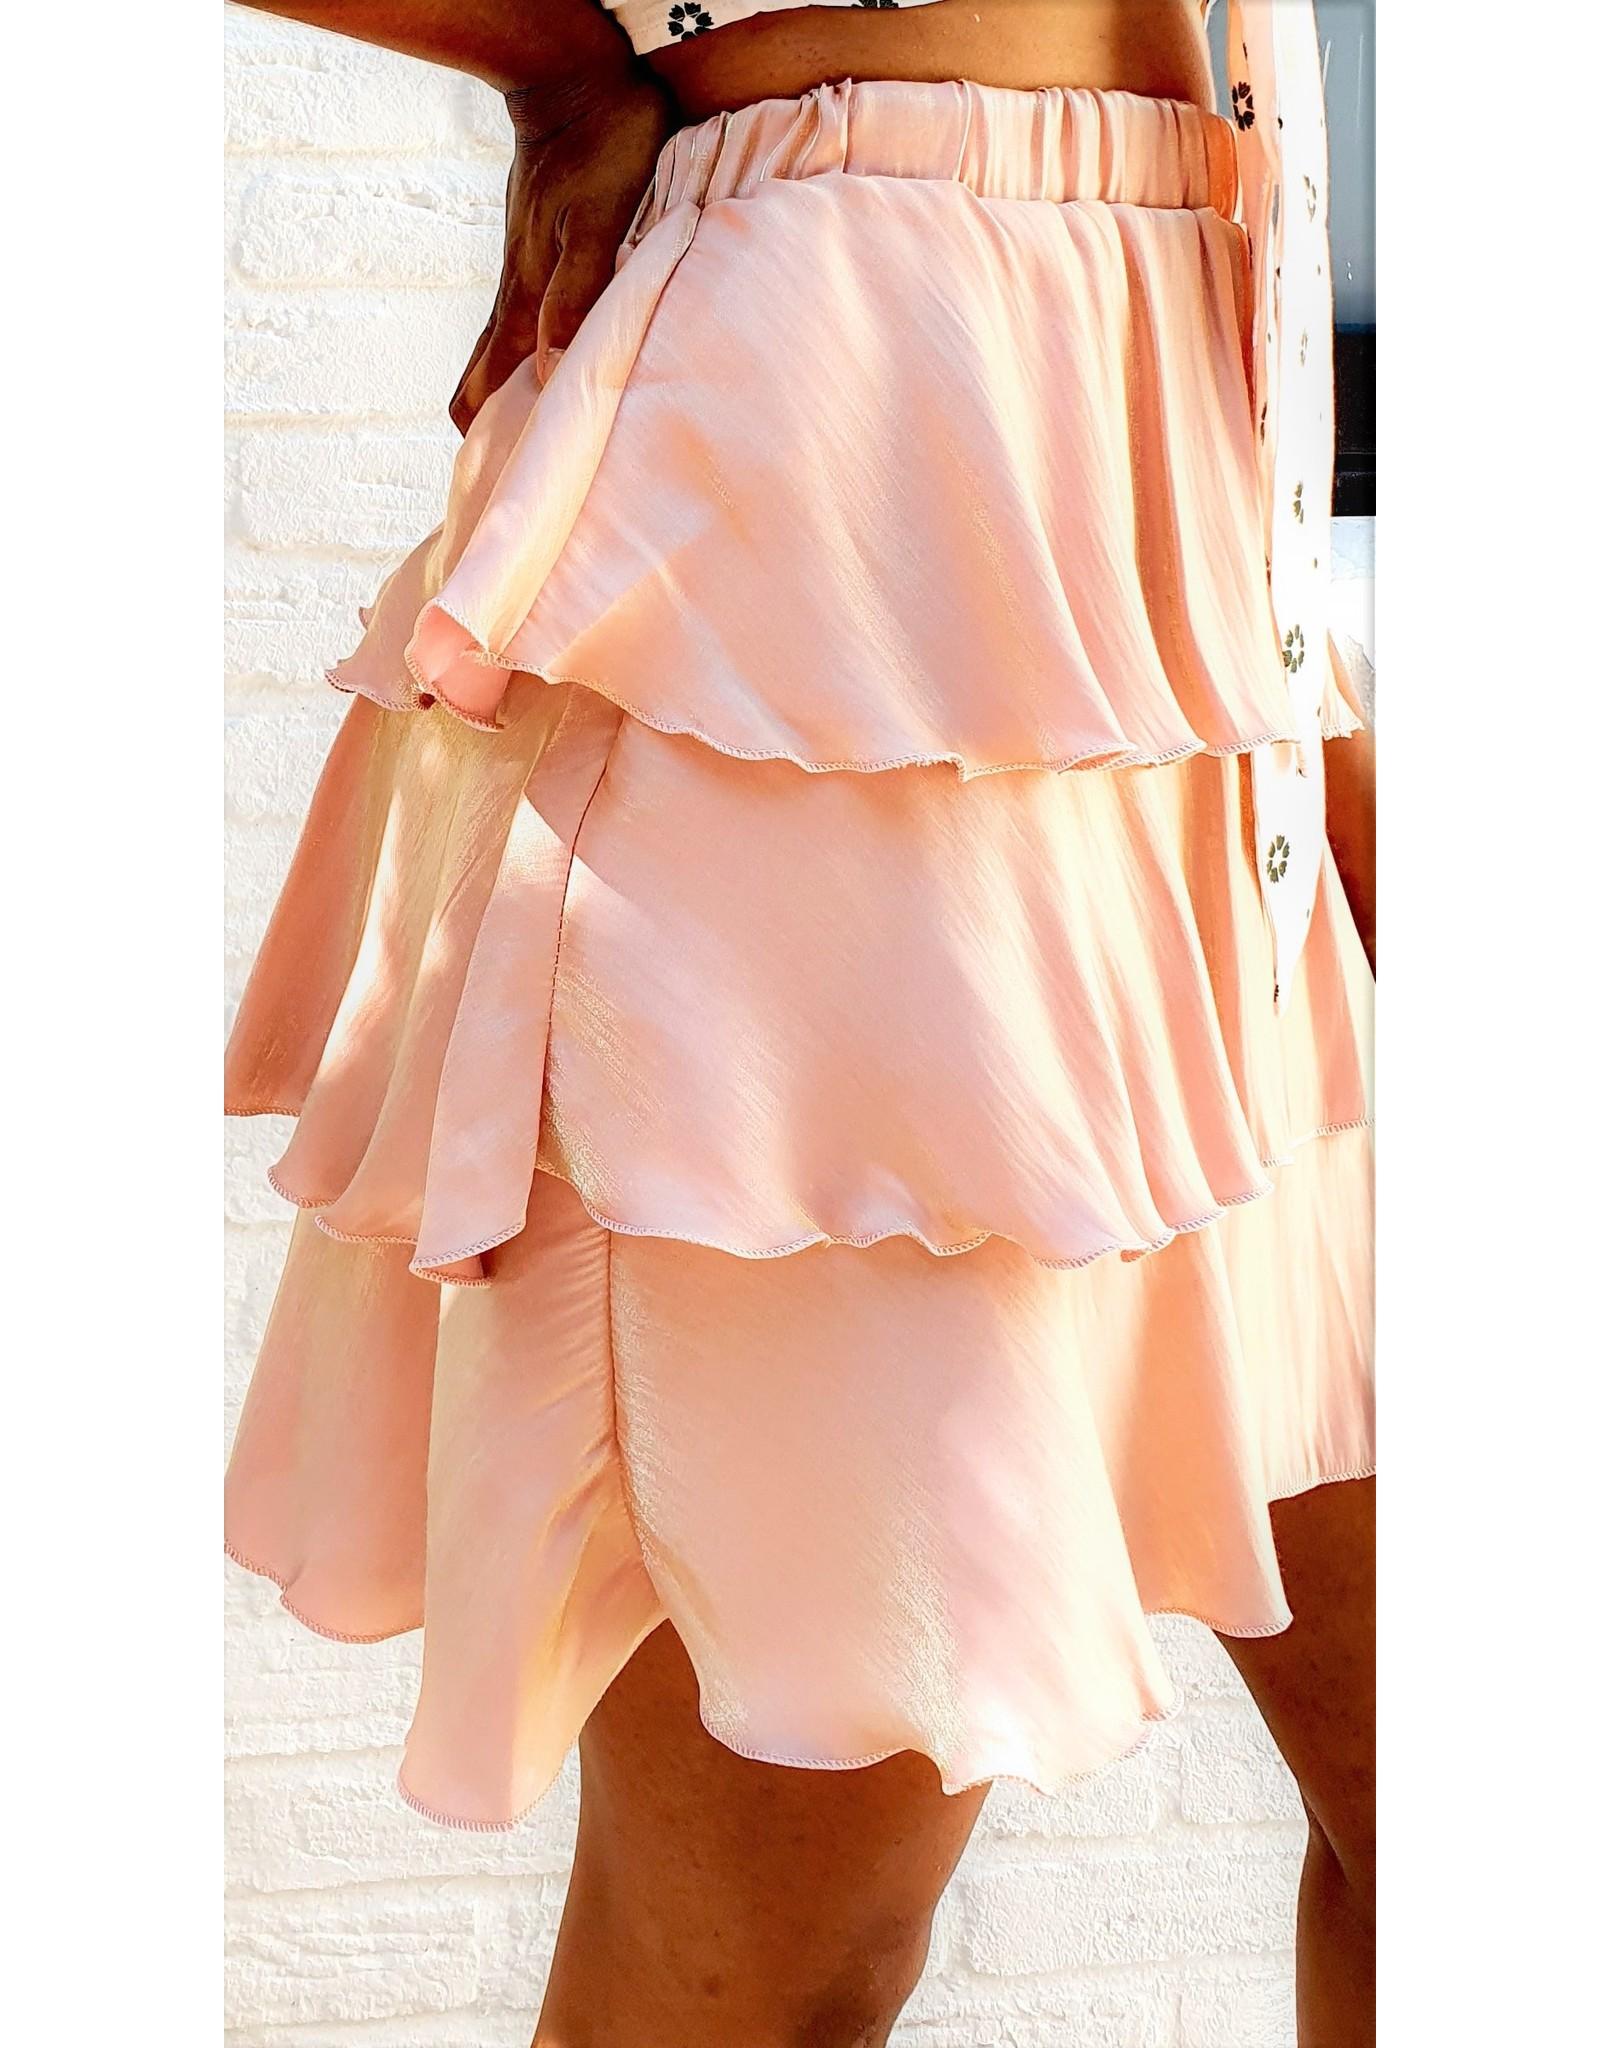 Short shiny pink